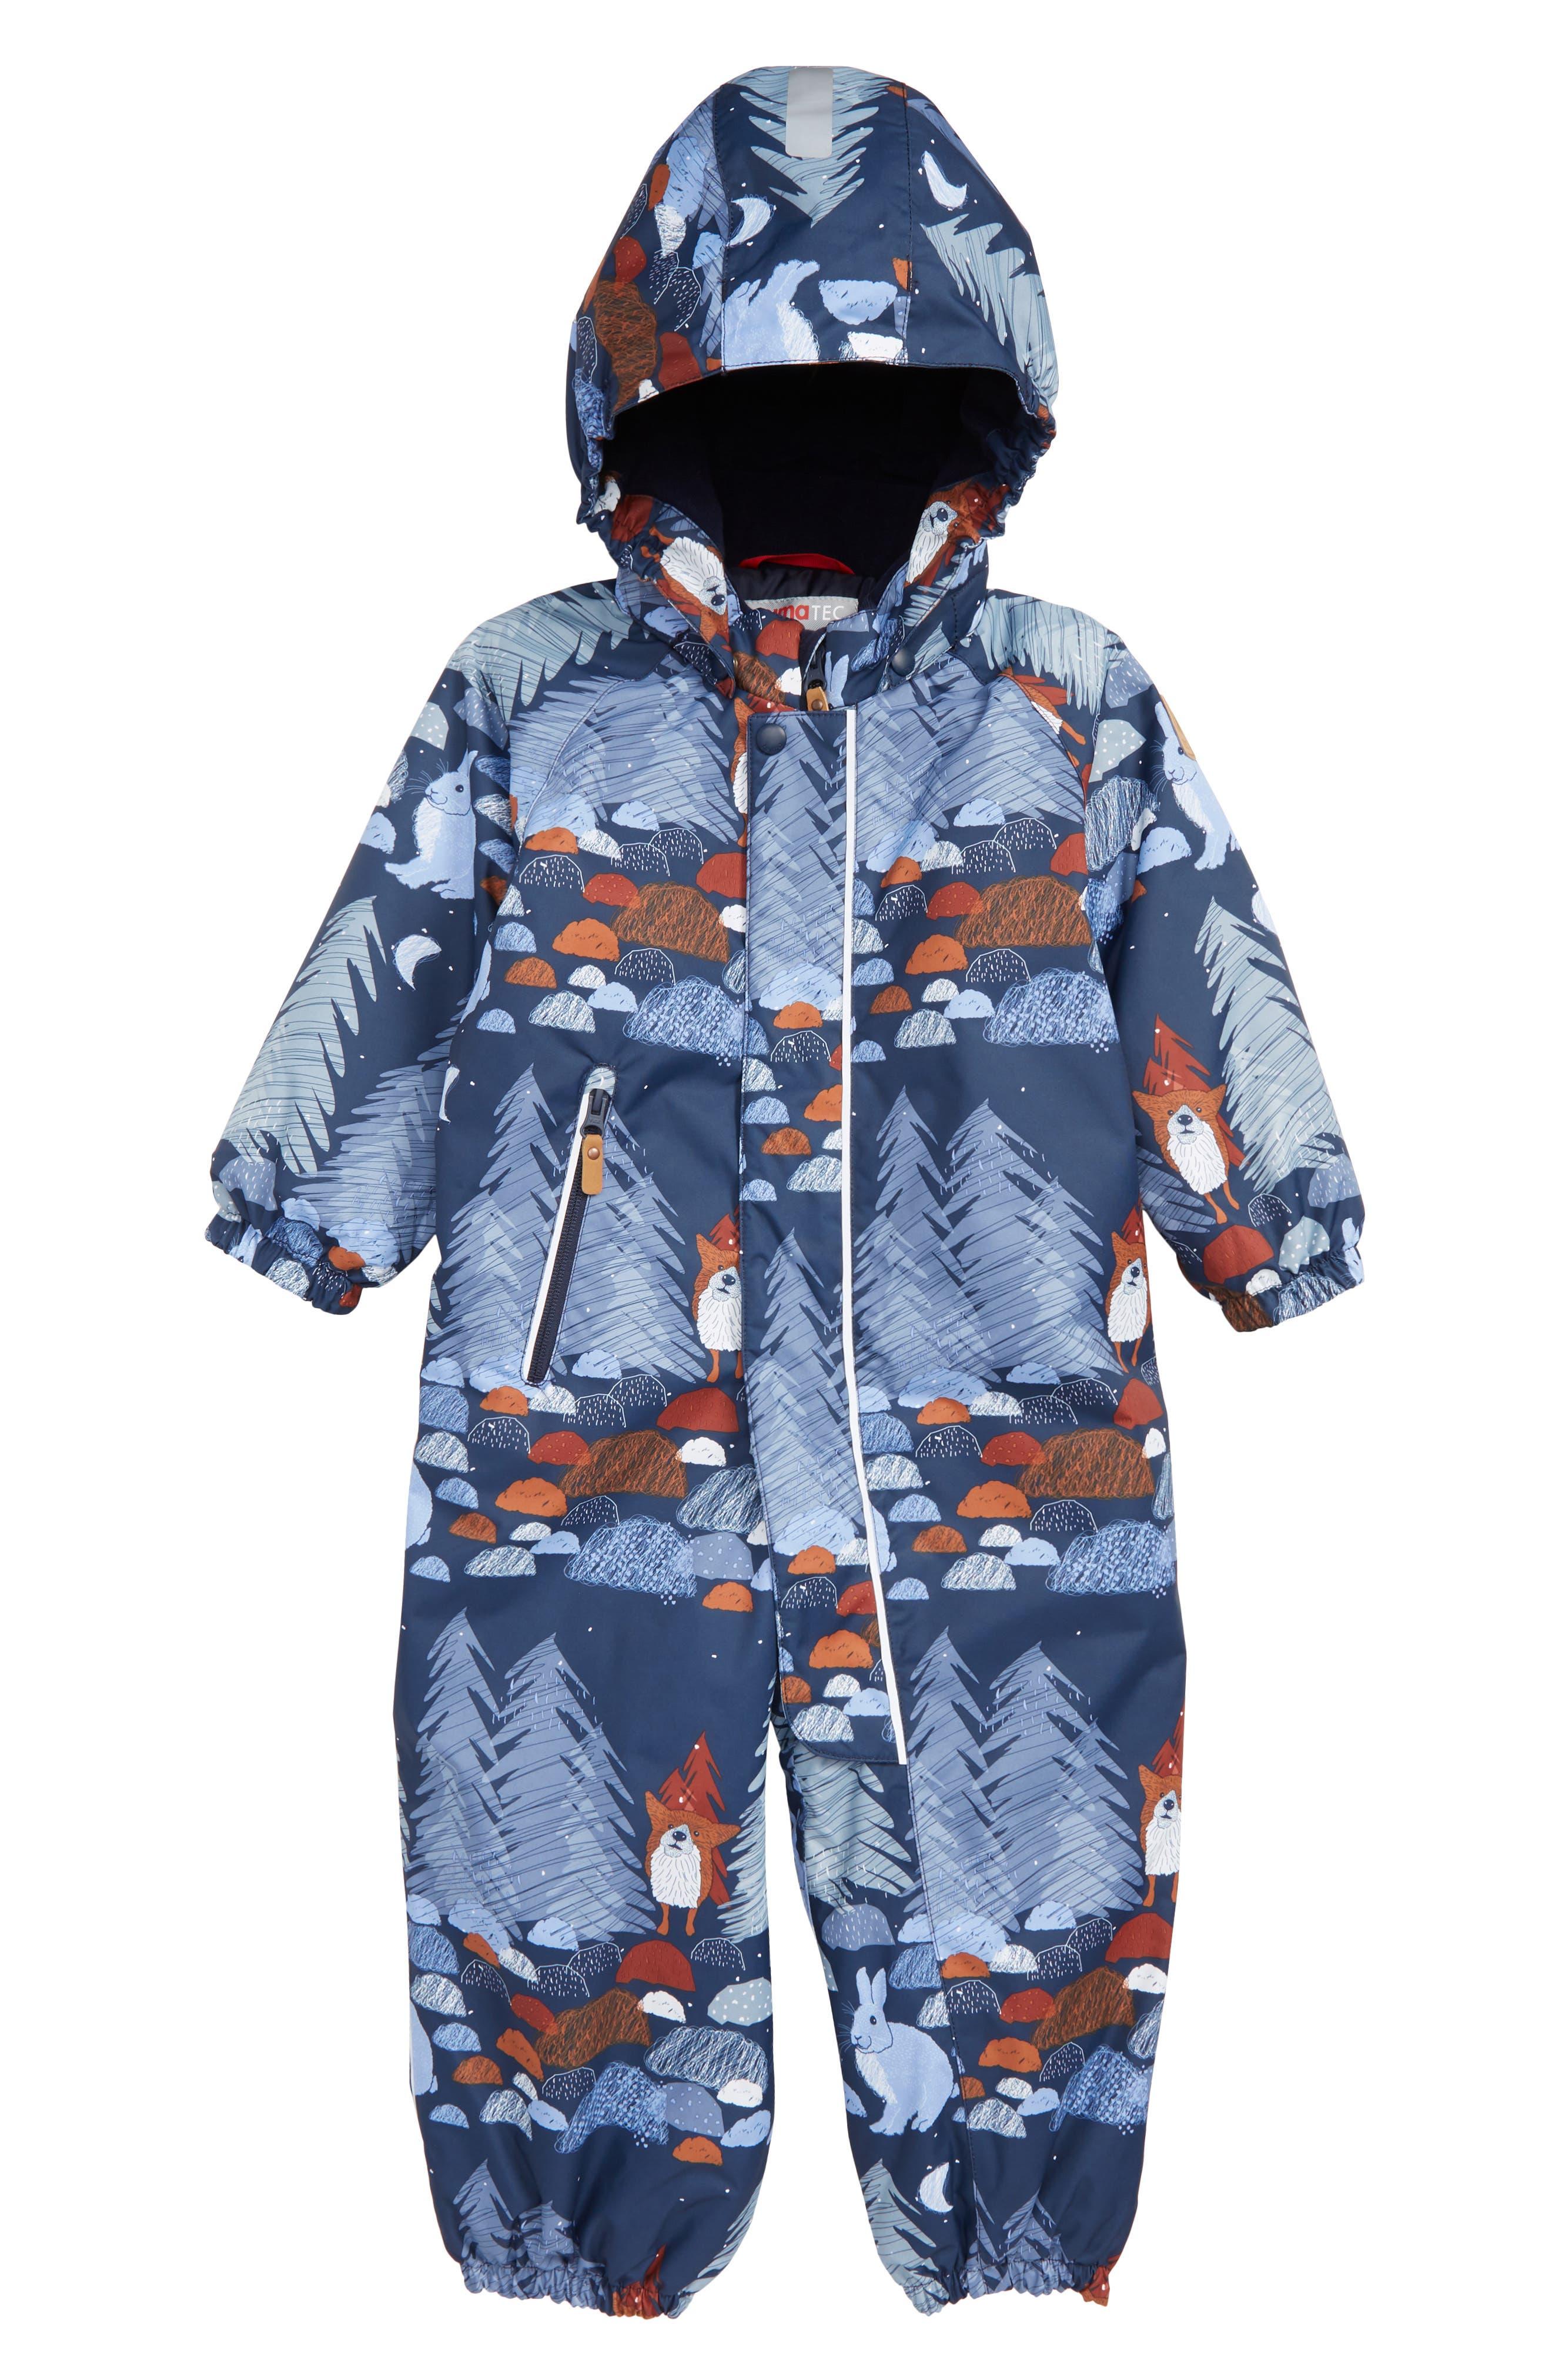 Toddler Boys Reima Puhuri Reimatec Waterproof Snow Suit Size 3Y  98 cm  Blue